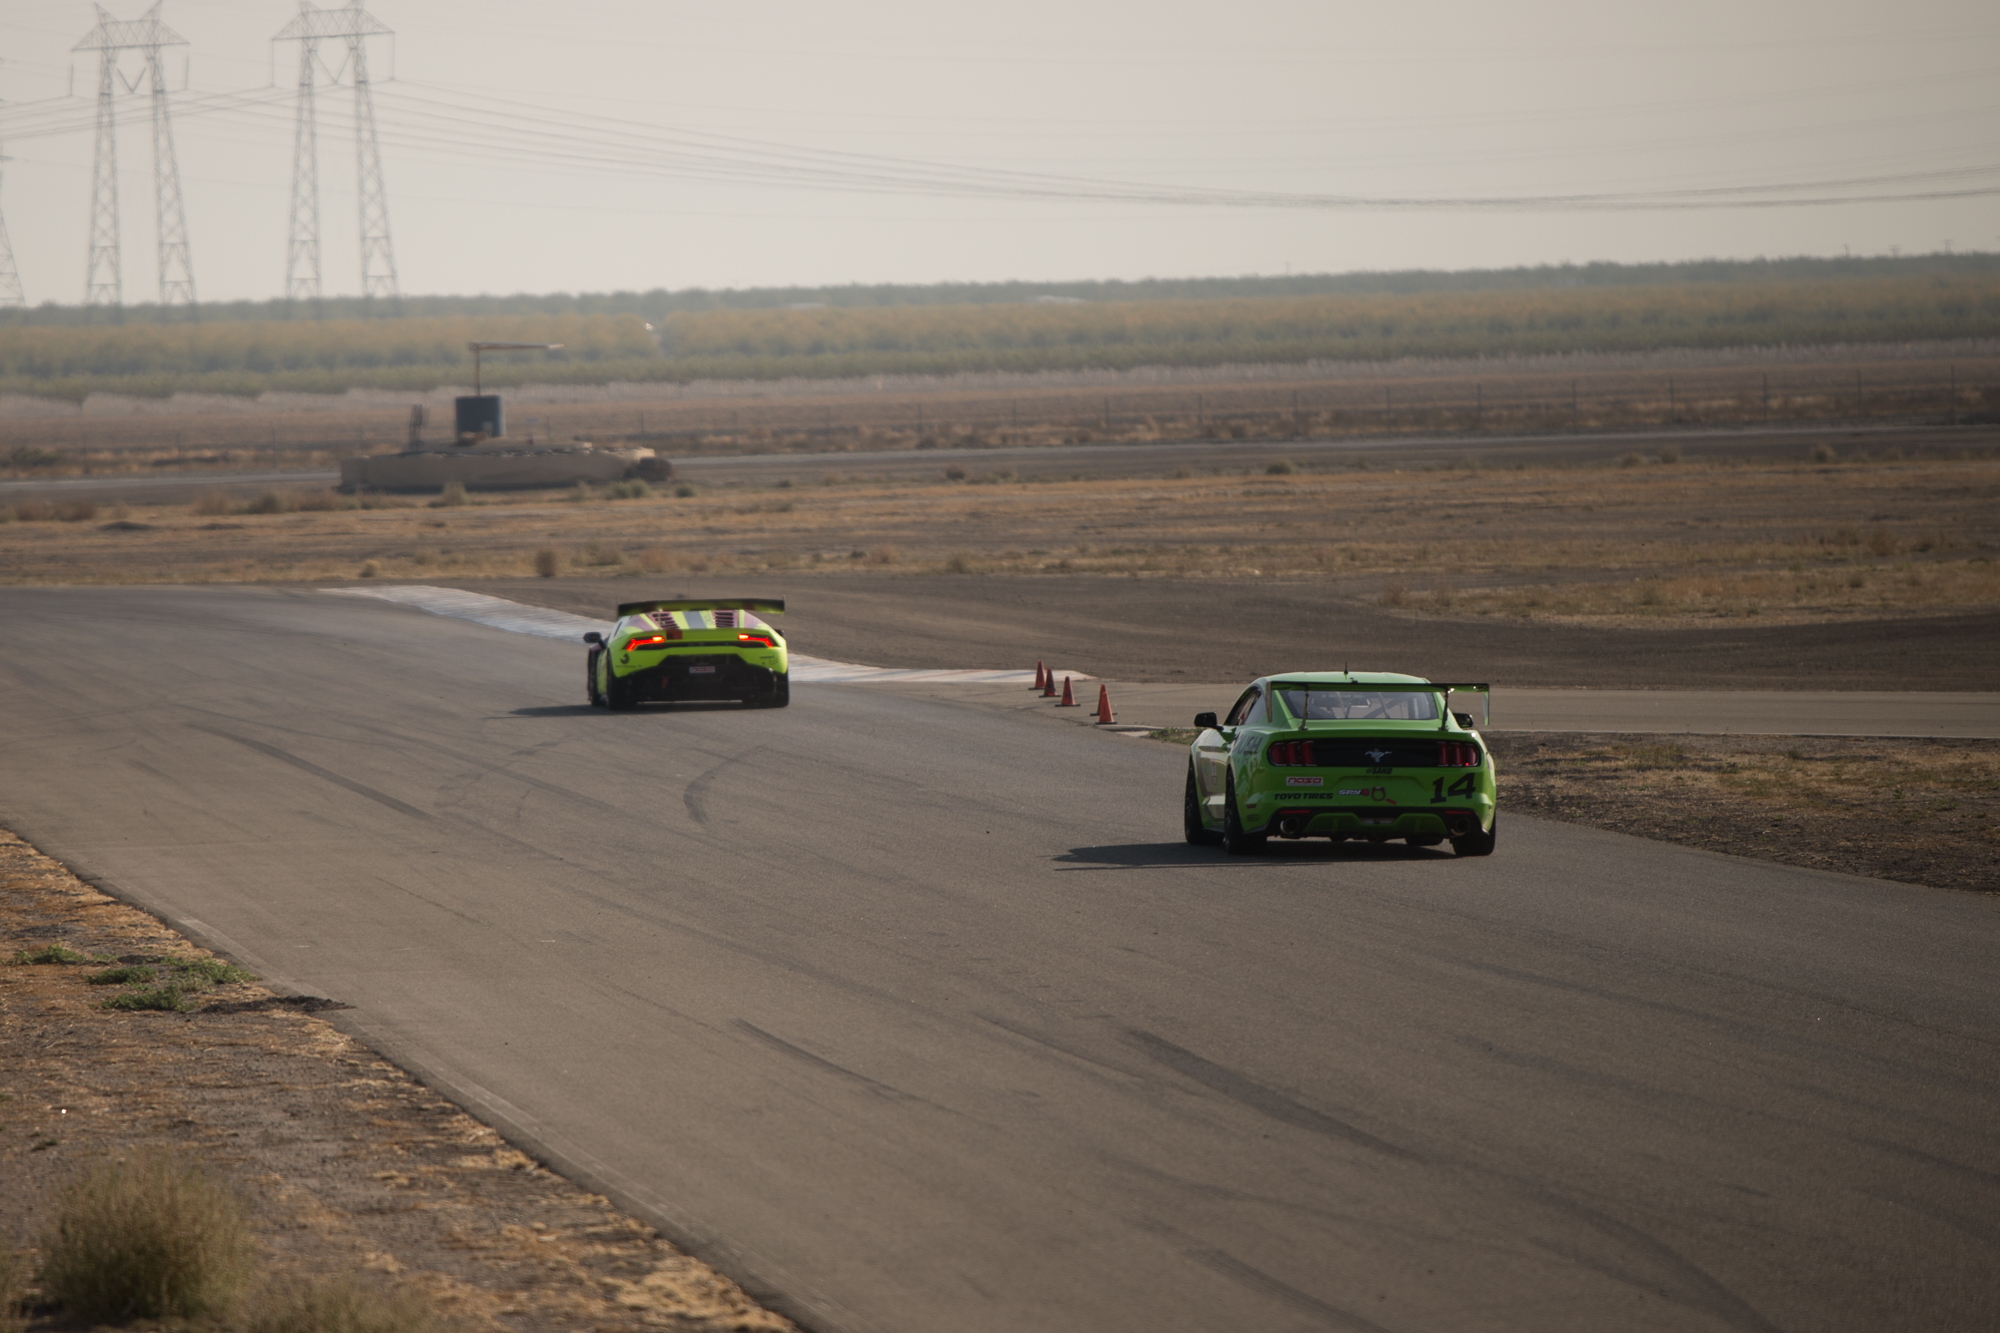 Steven-Racing-20171027-53591.jpg